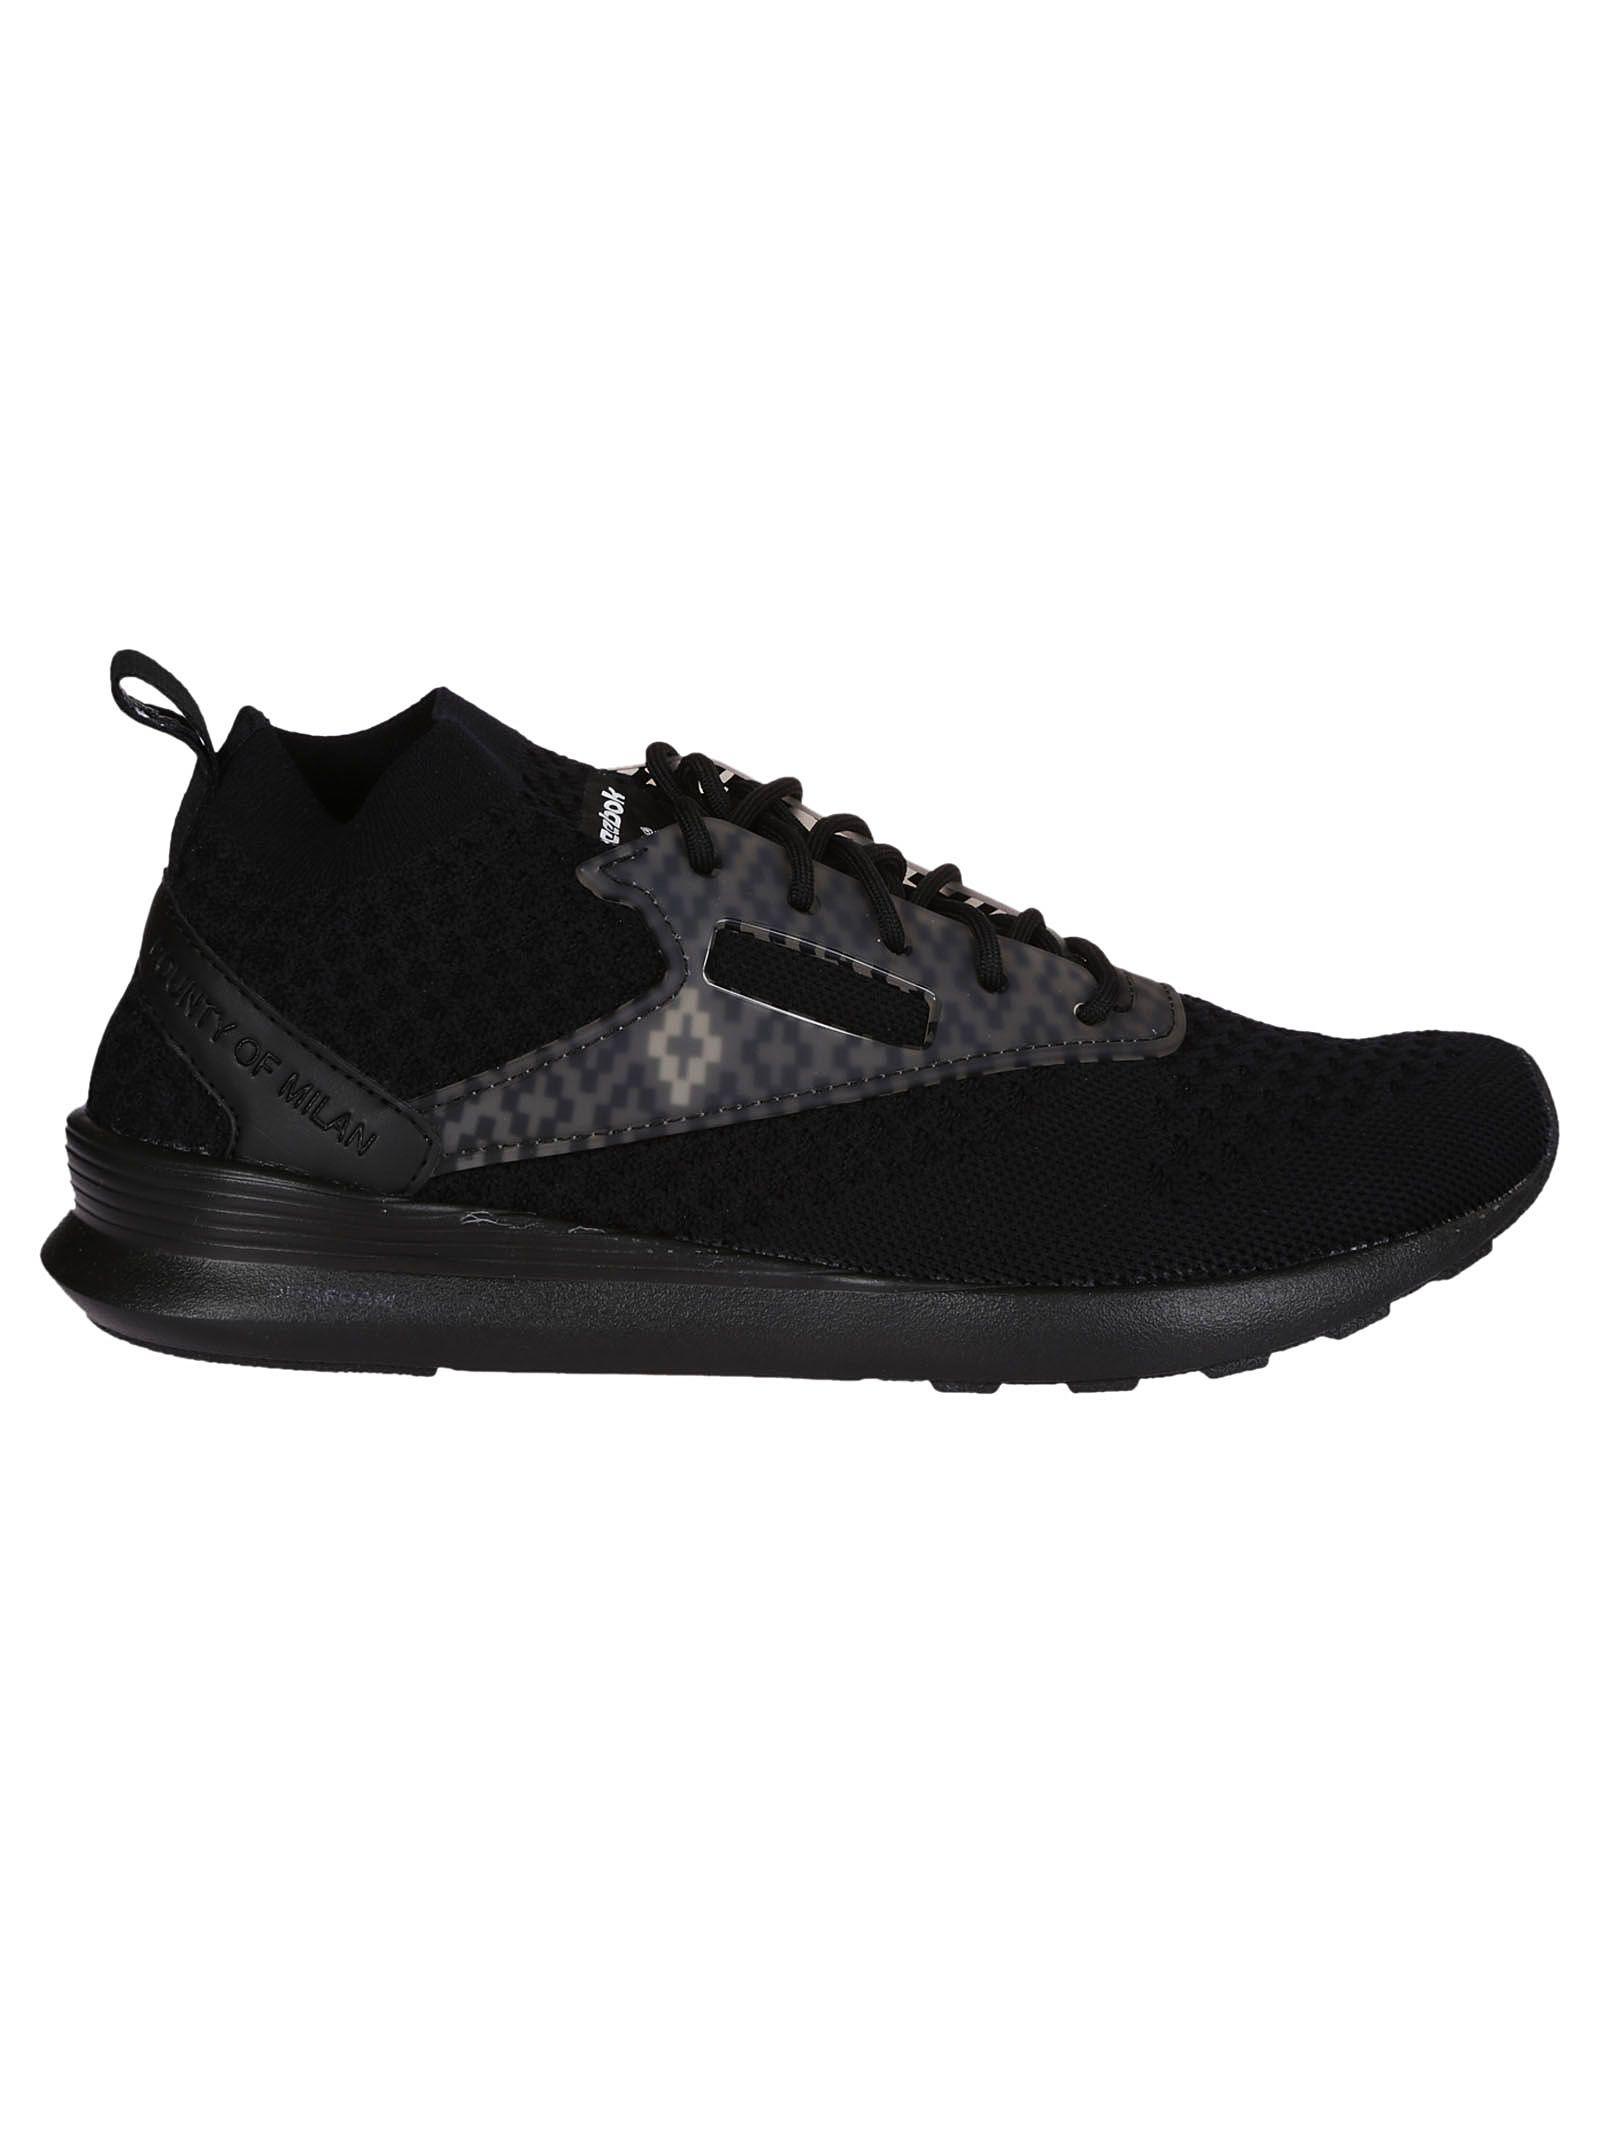 Marcelo Burlon Zoku Sneakers